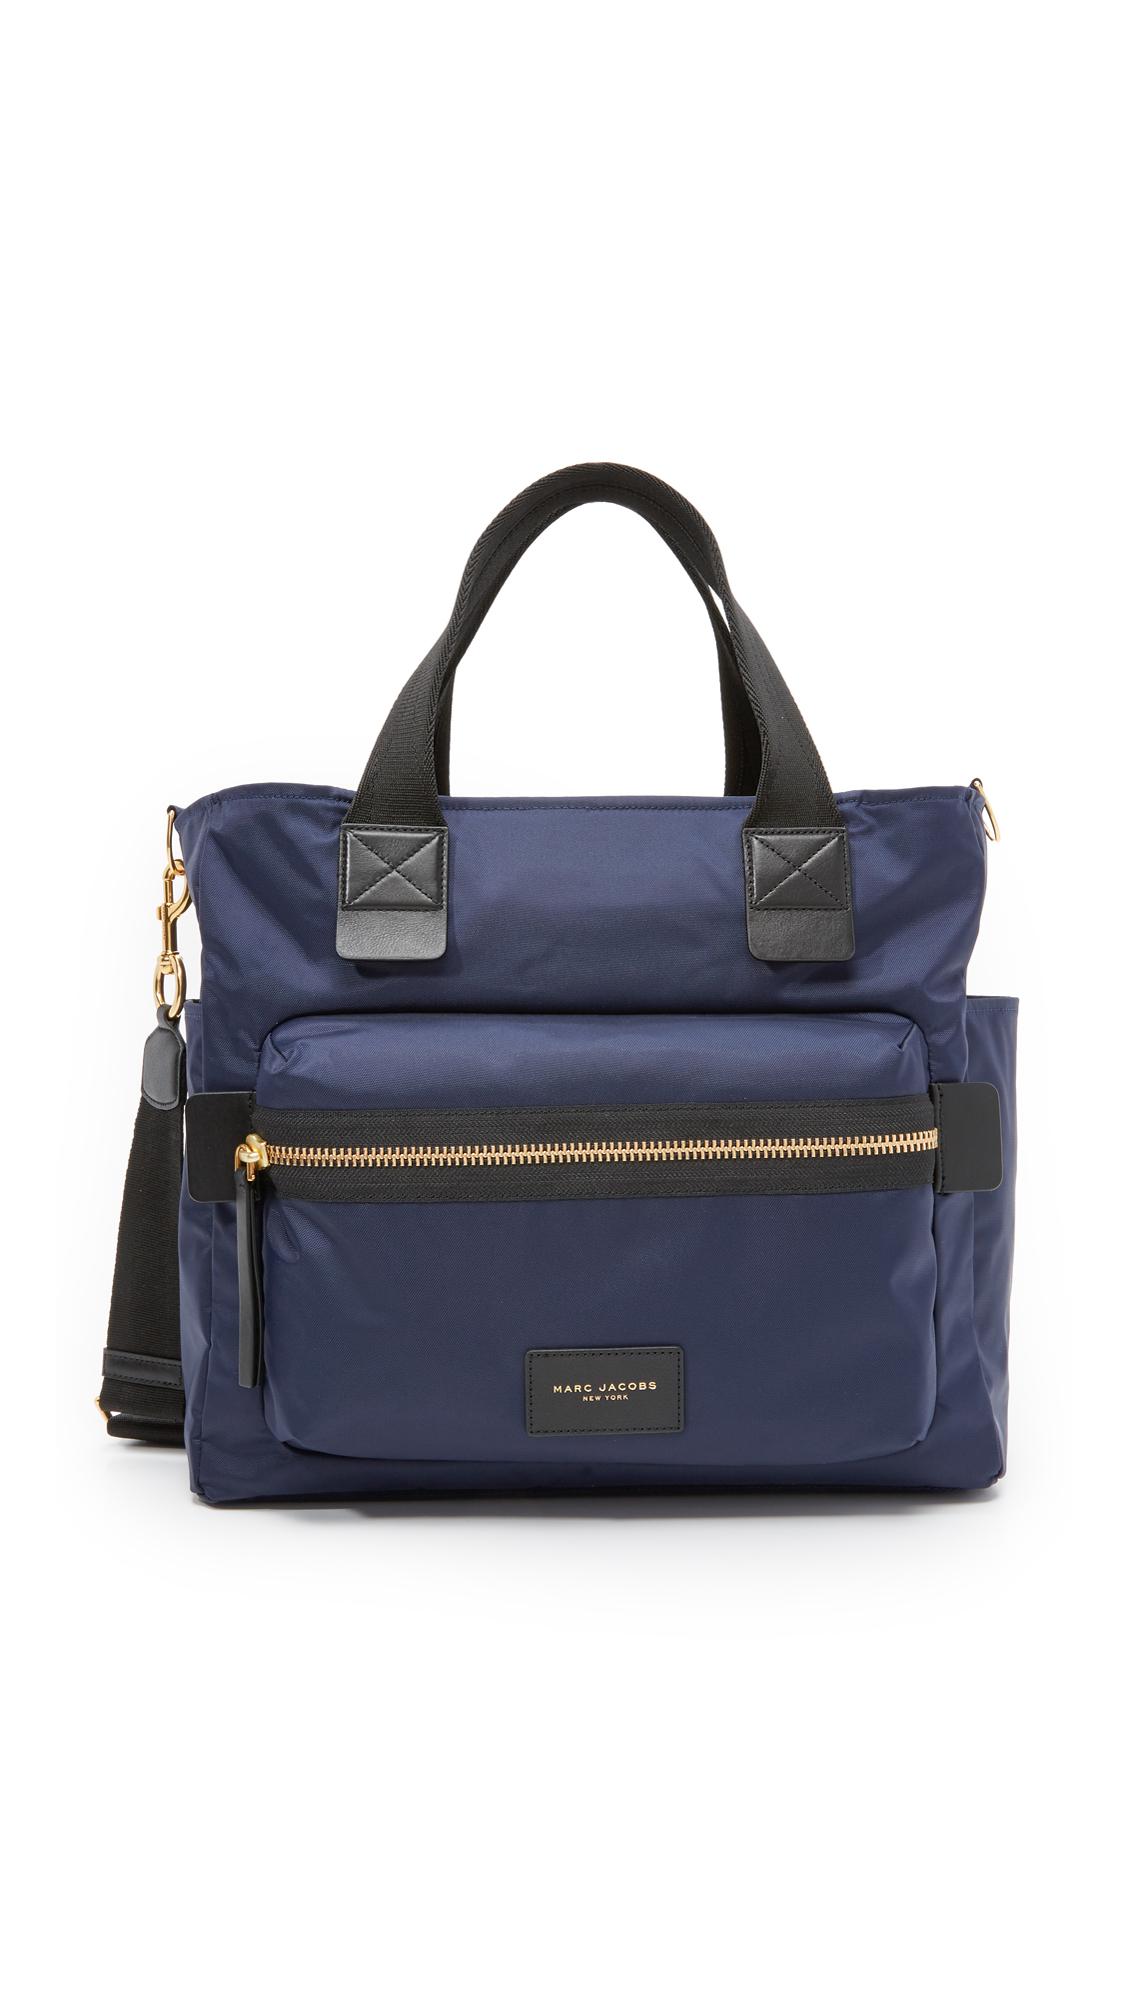 Marc Jacobs Nylon Bag 92